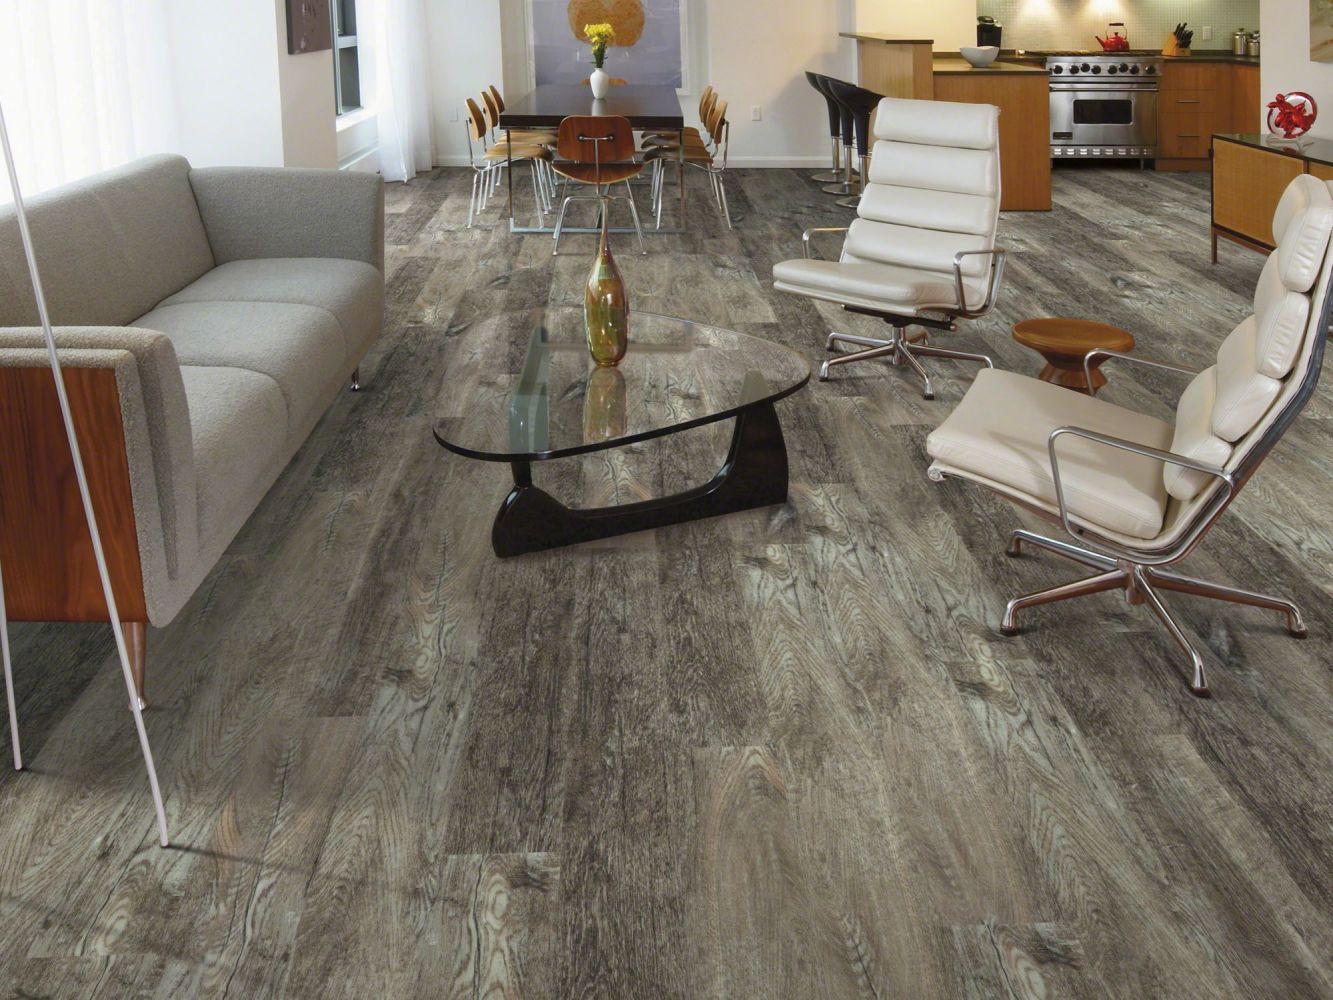 Shaw Floors Nfa HS Ventura Smoky Oak 00556_VH542